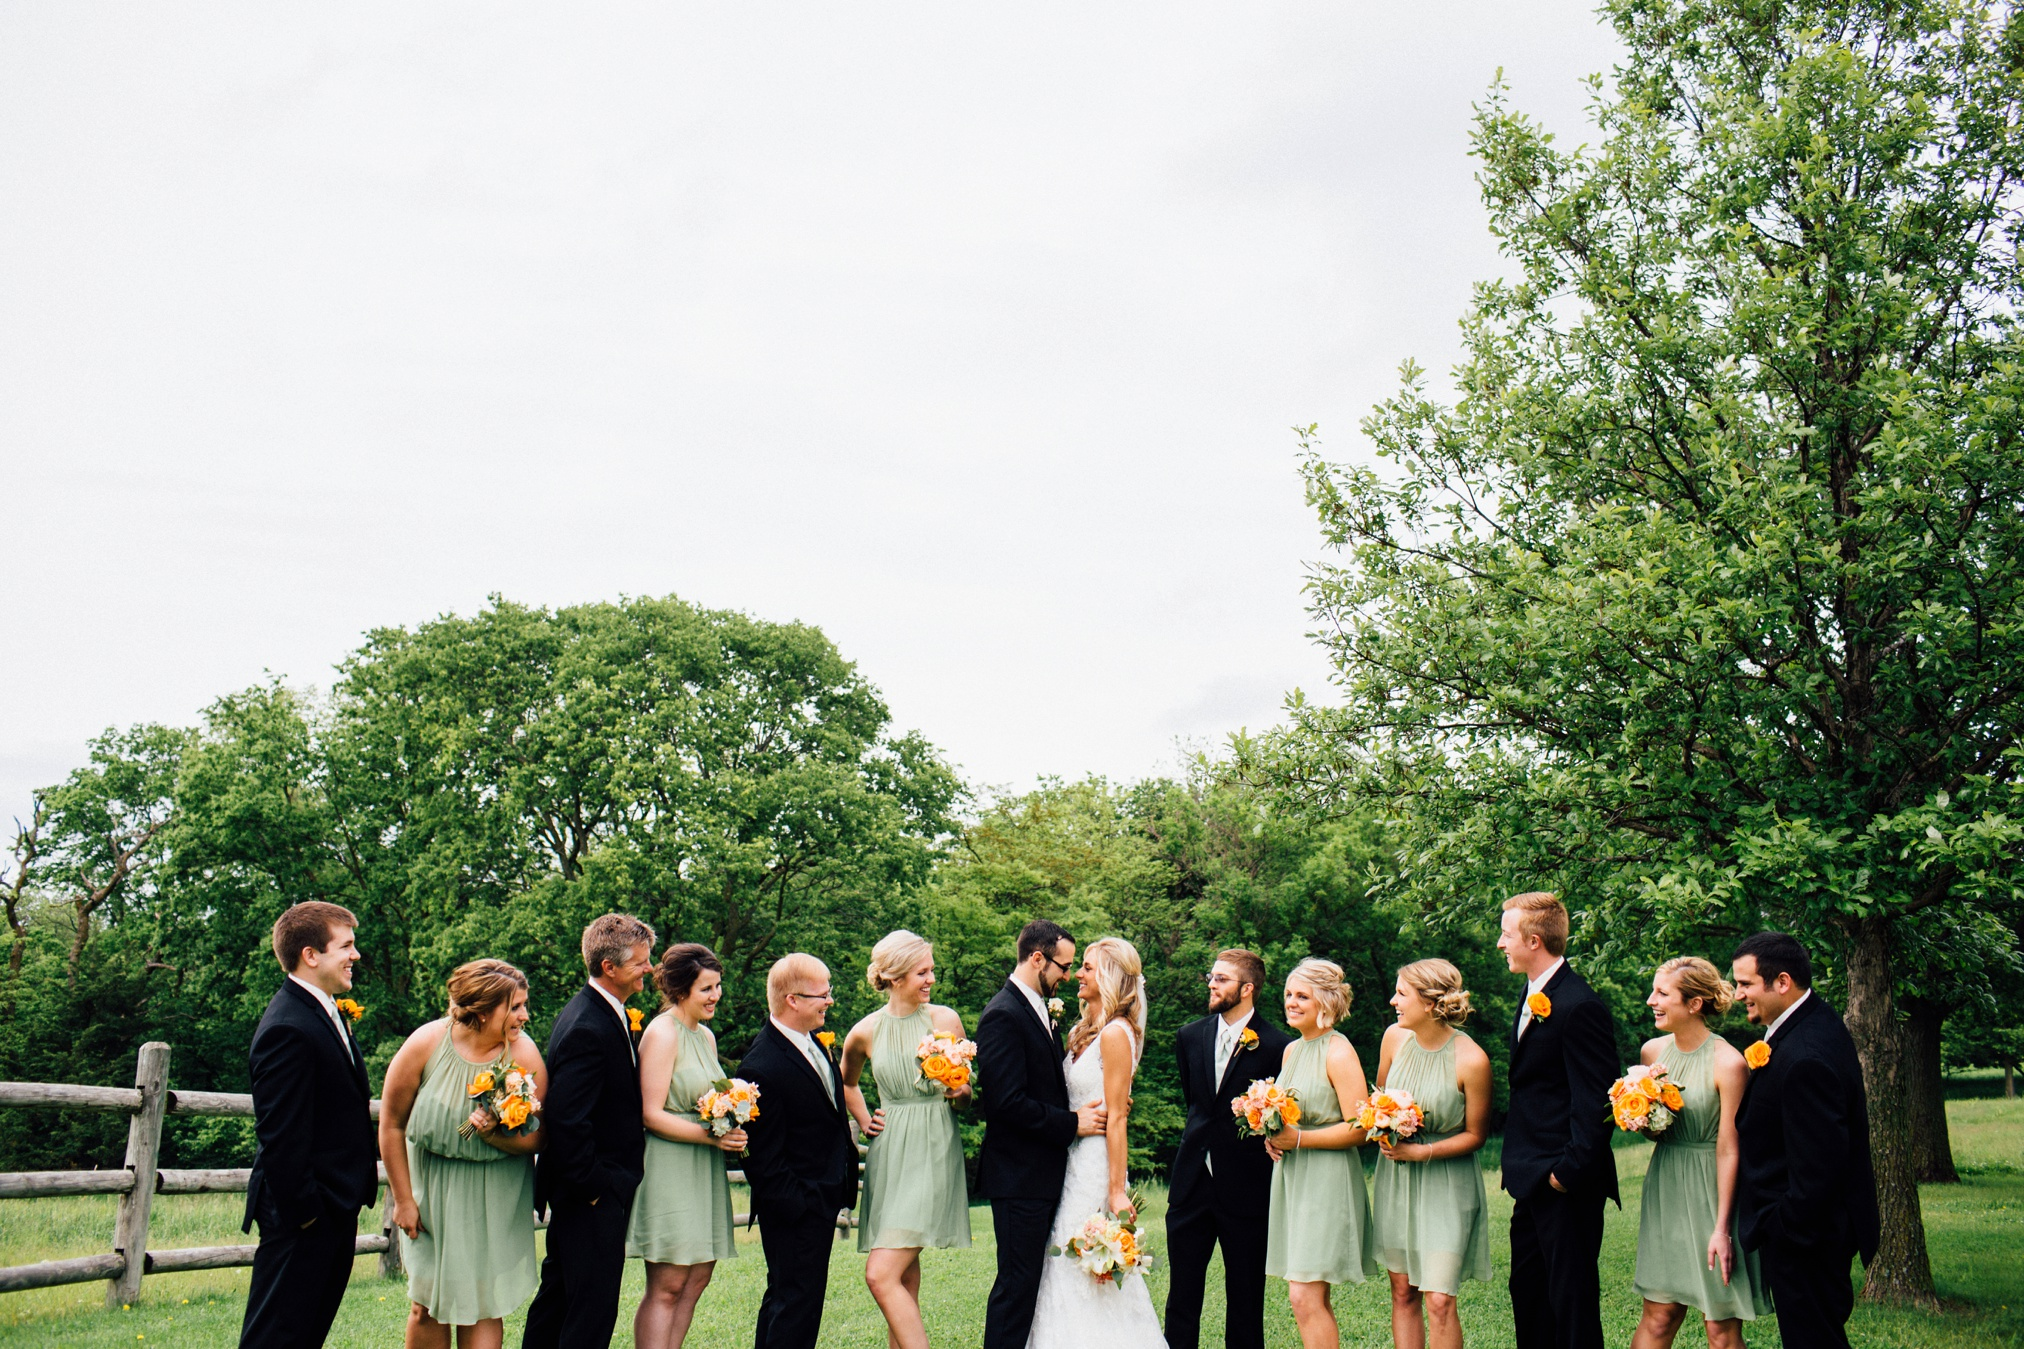 schmid_wedding-624.jpg